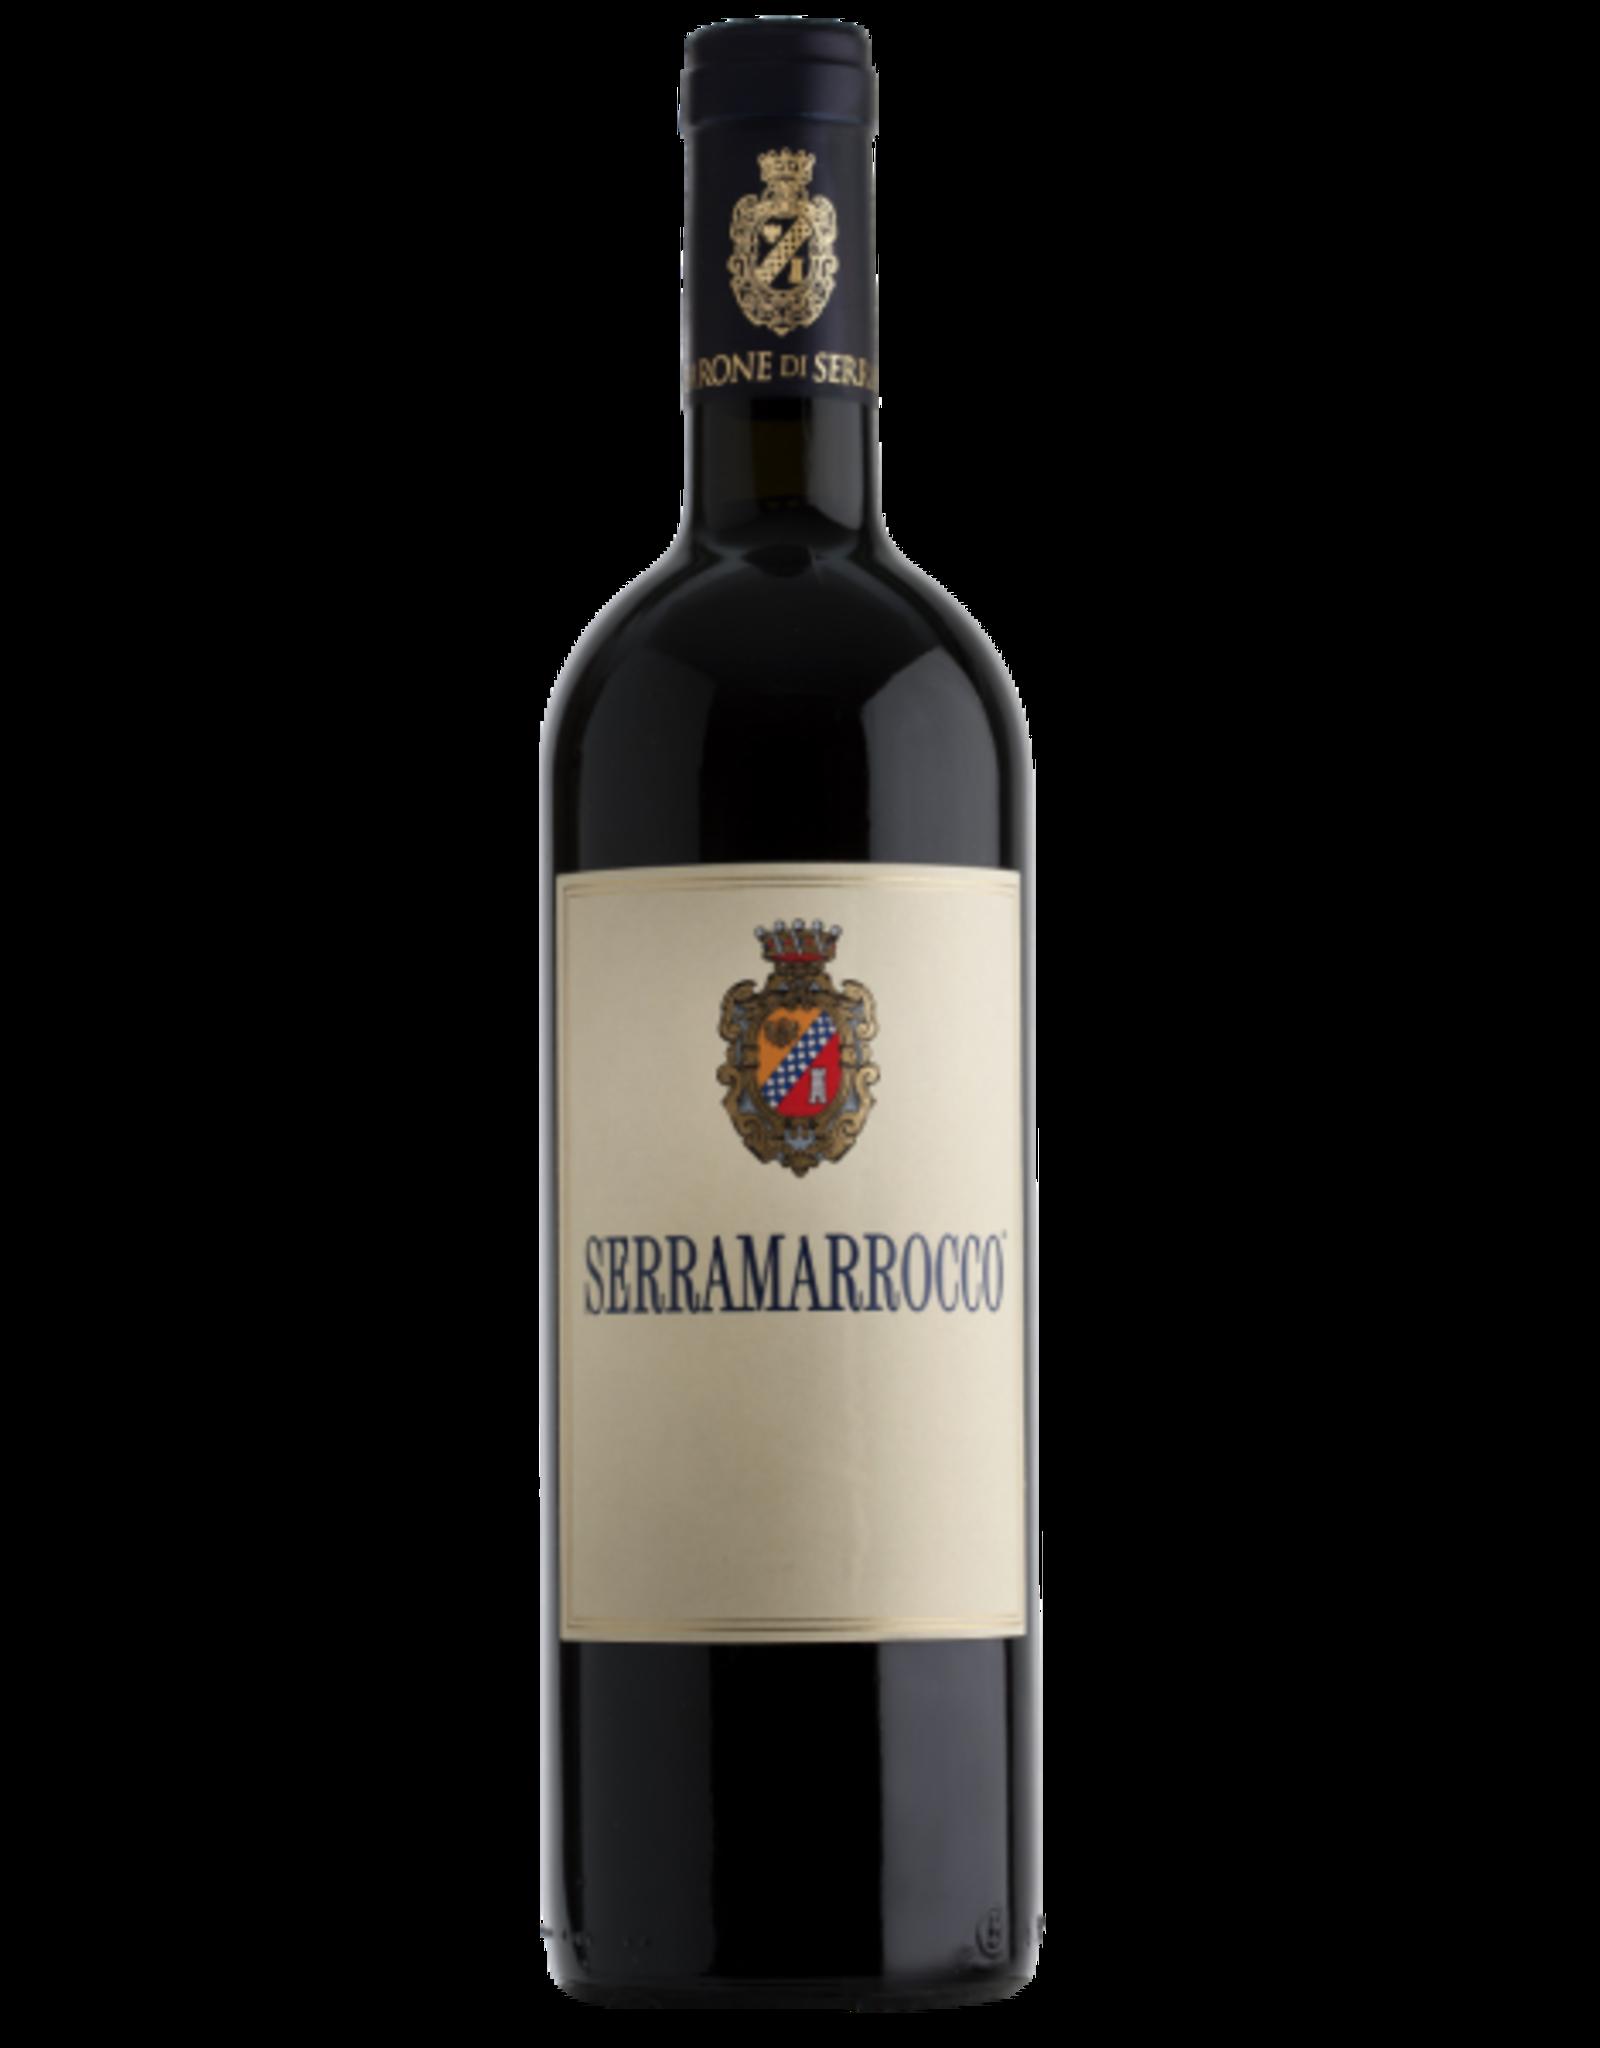 Serramarrocco Serramarrocco Bordeaux Blend 2014